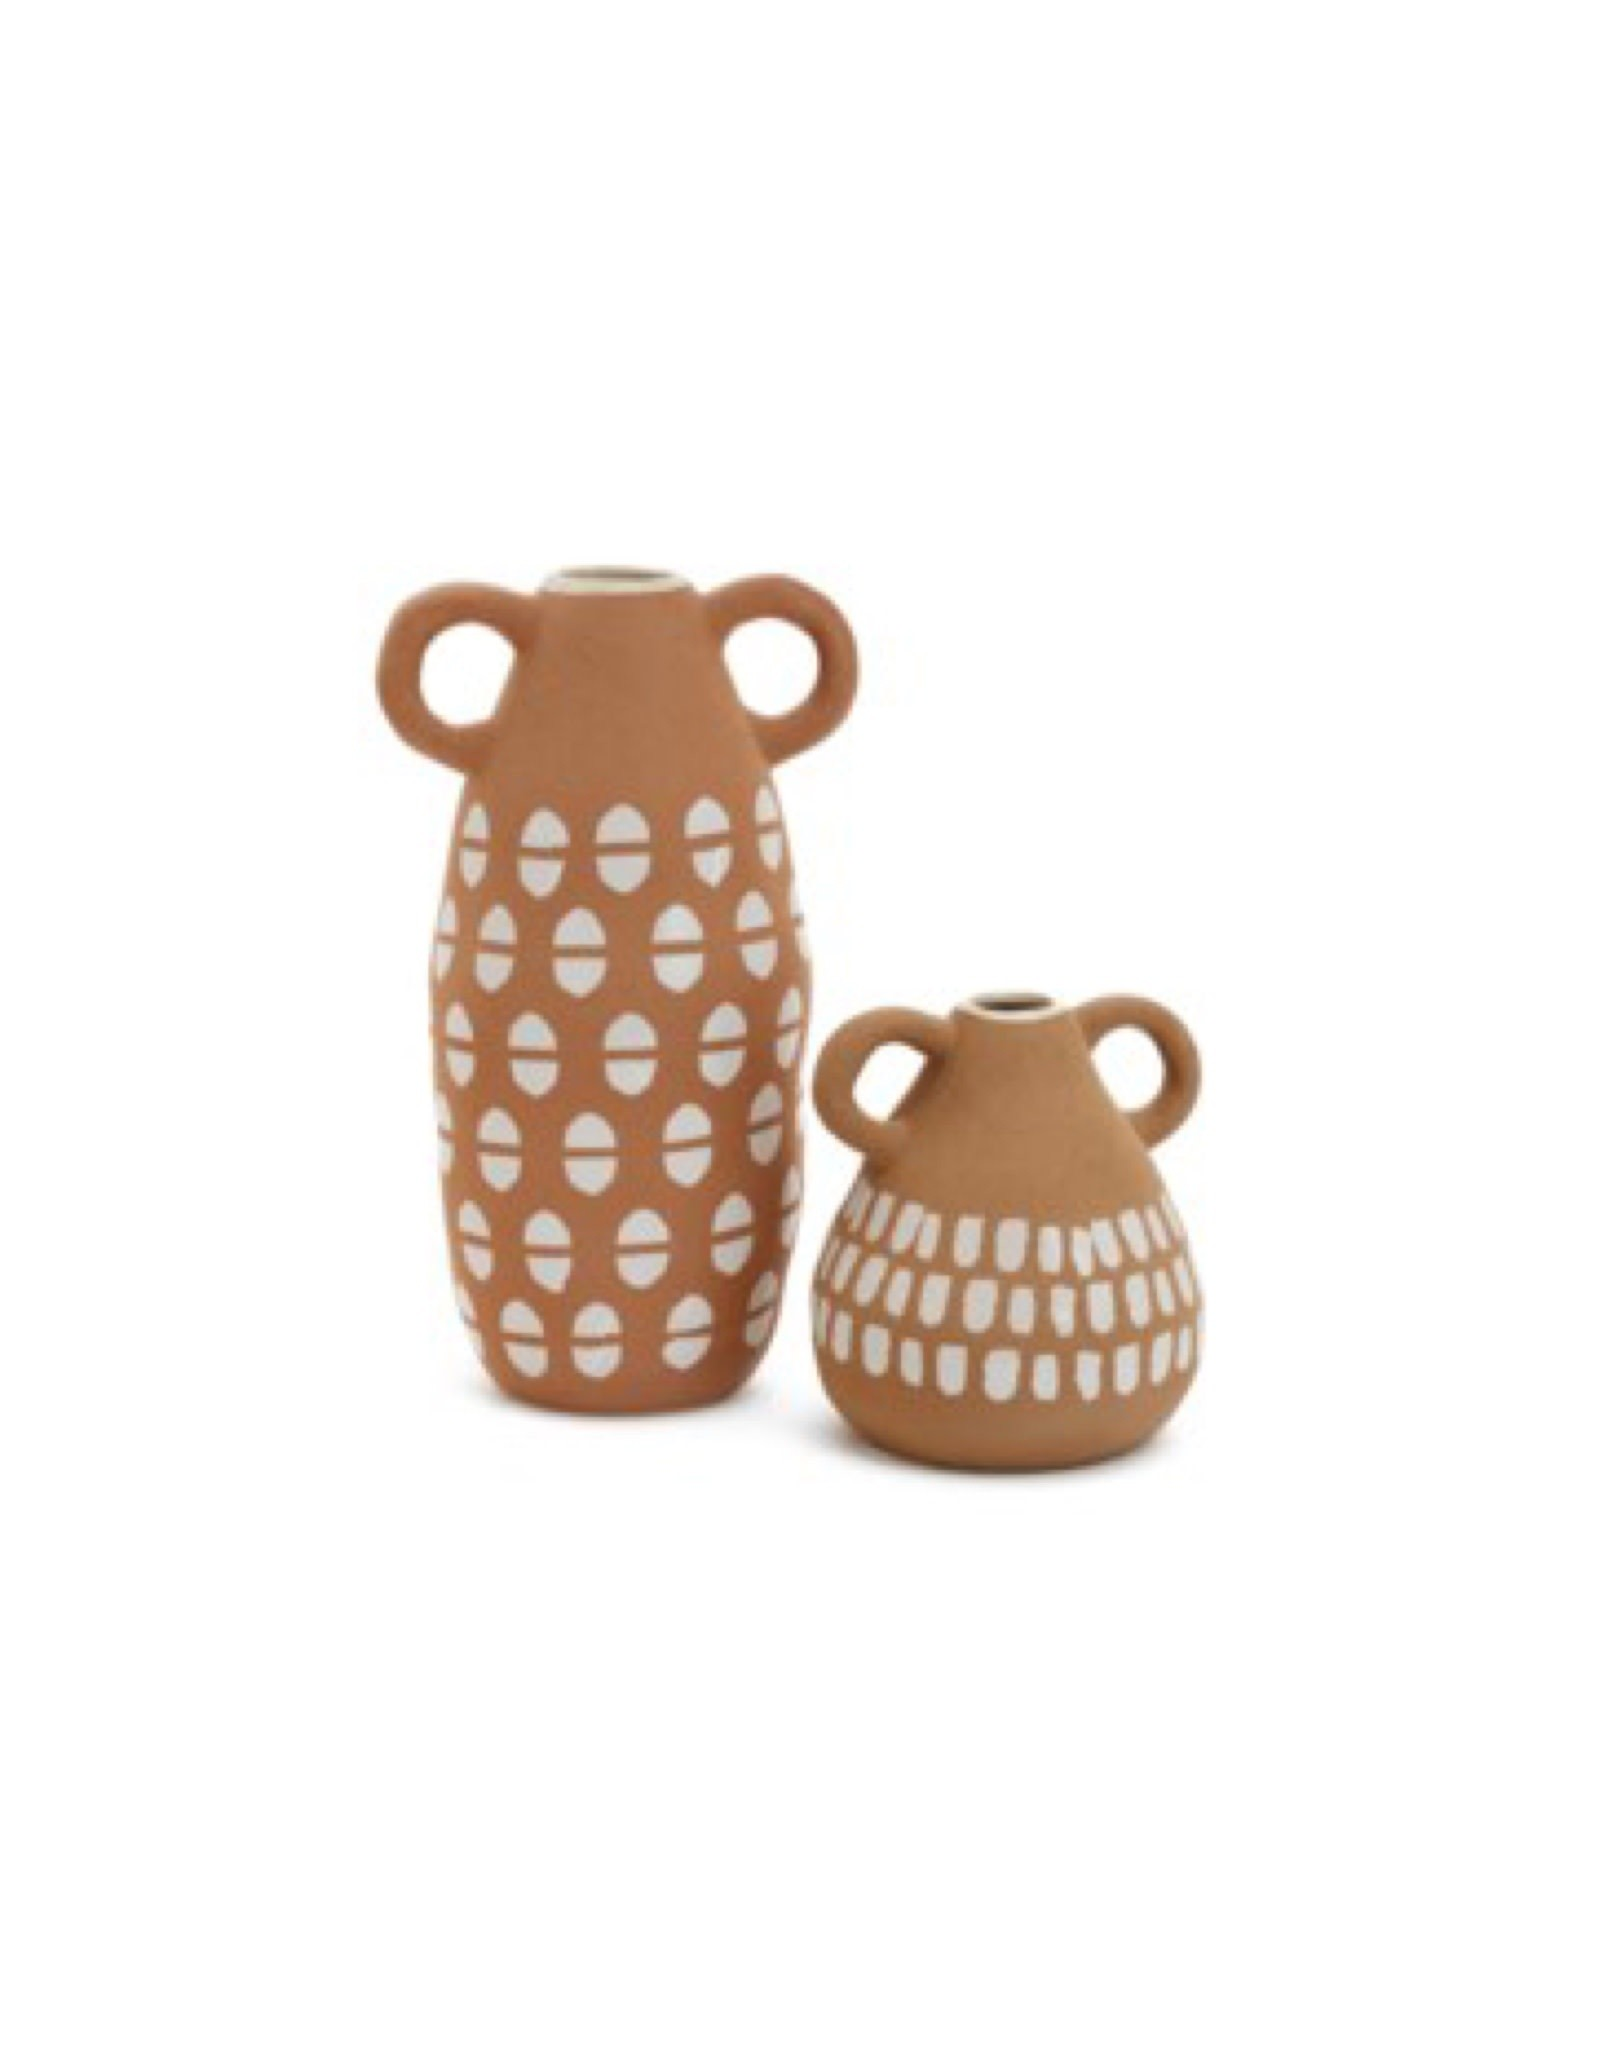 Vase PC Cera Loop Handles Small